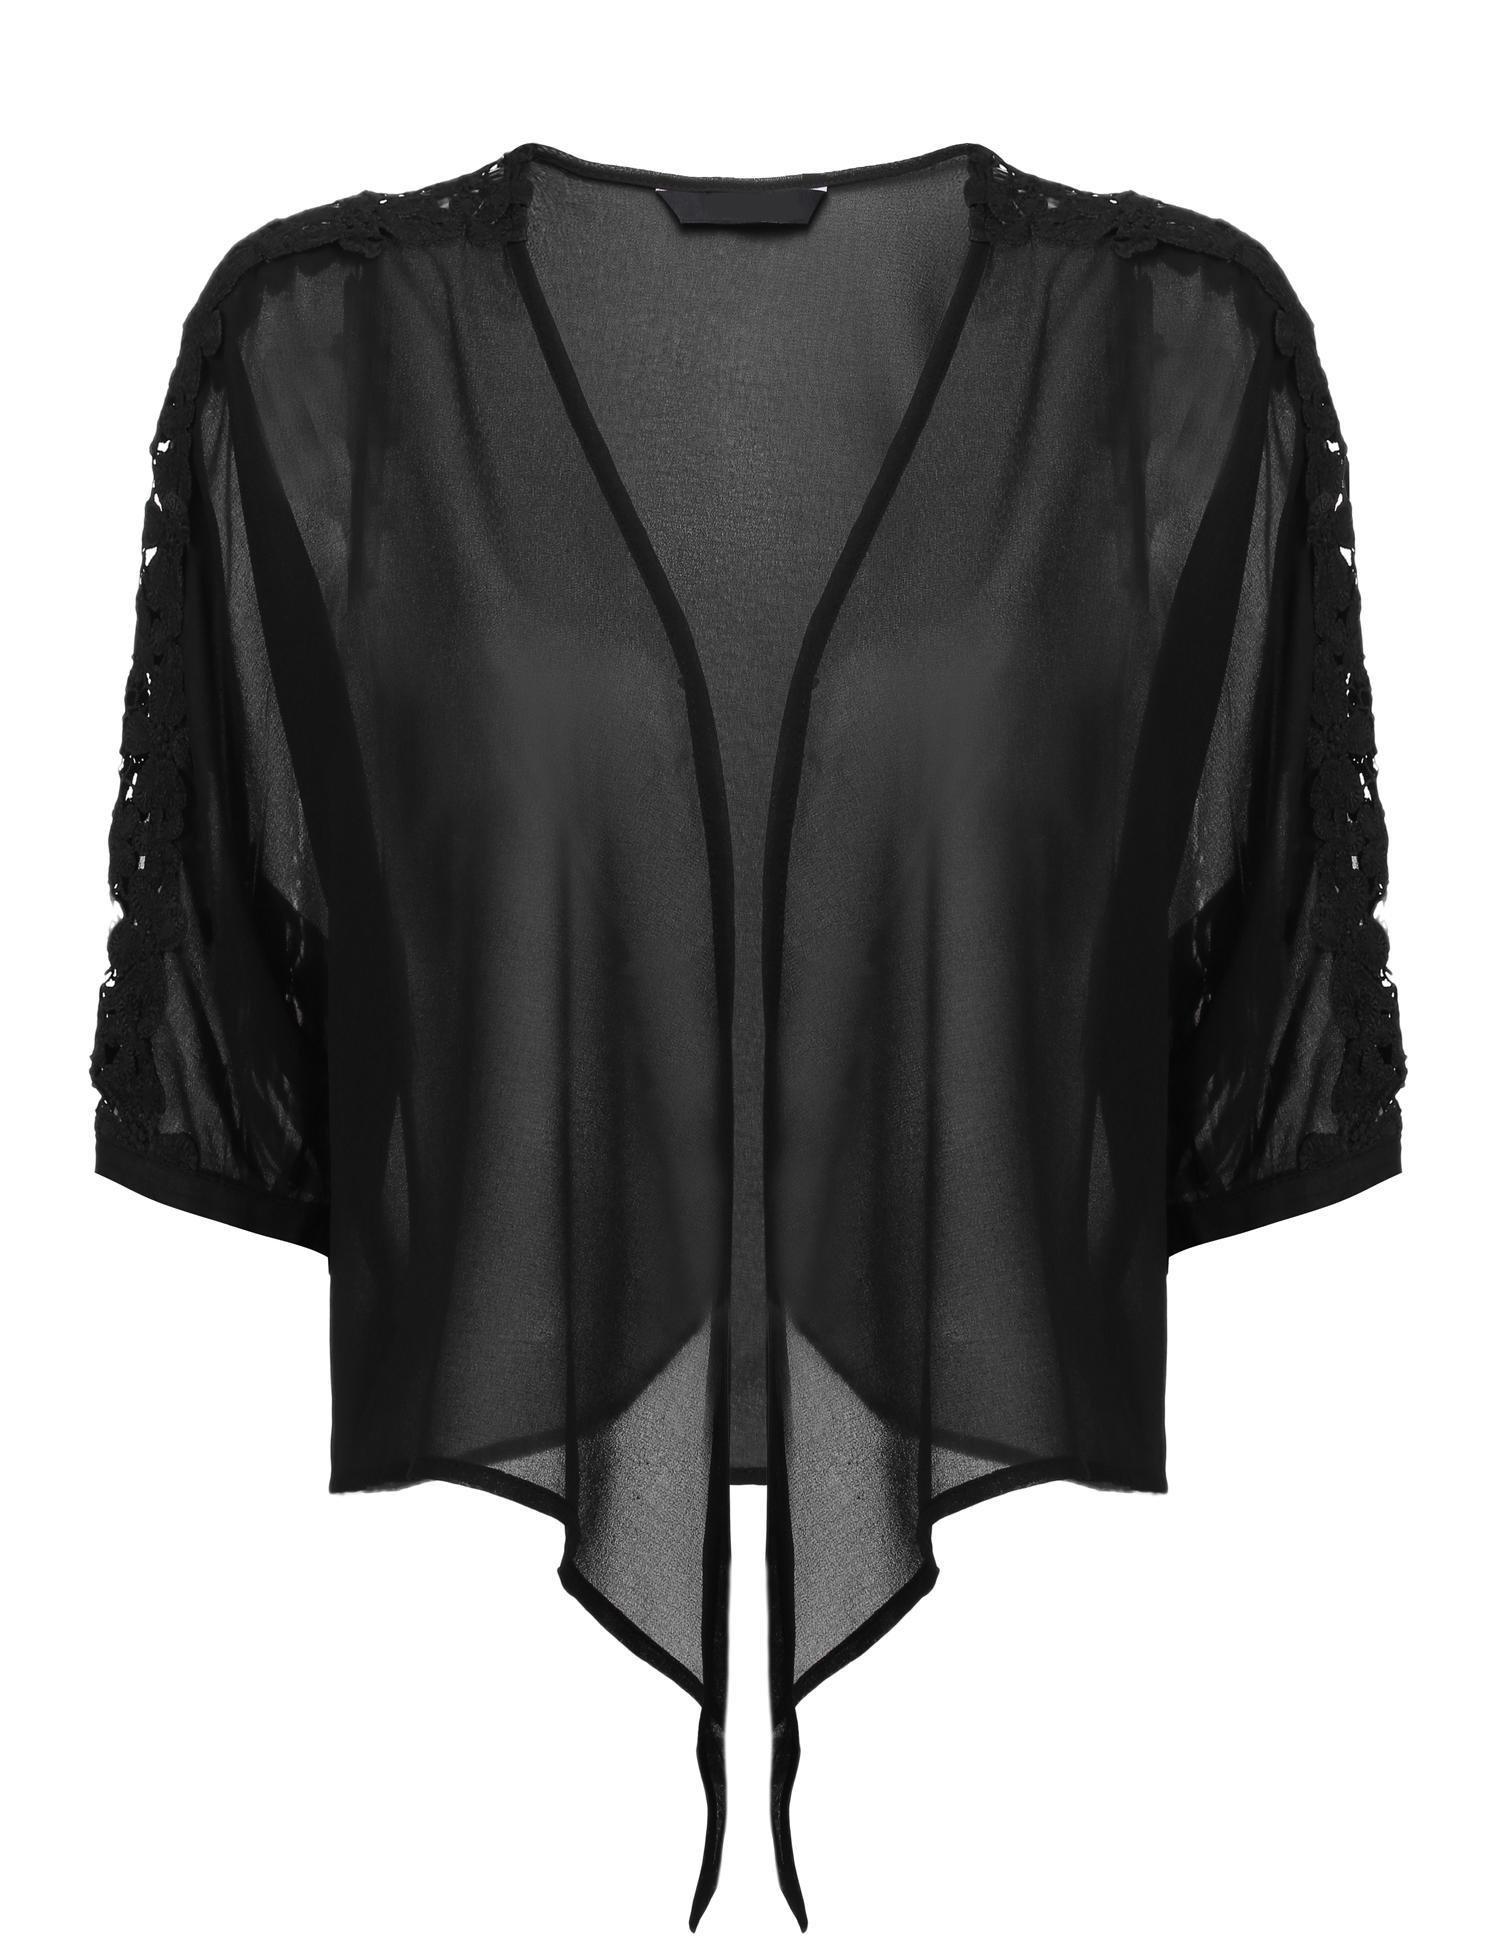 Grabsa Women's Half Sleeve Sheer Chiffon Bolero Shrug Tie Front Open Front Cardigan